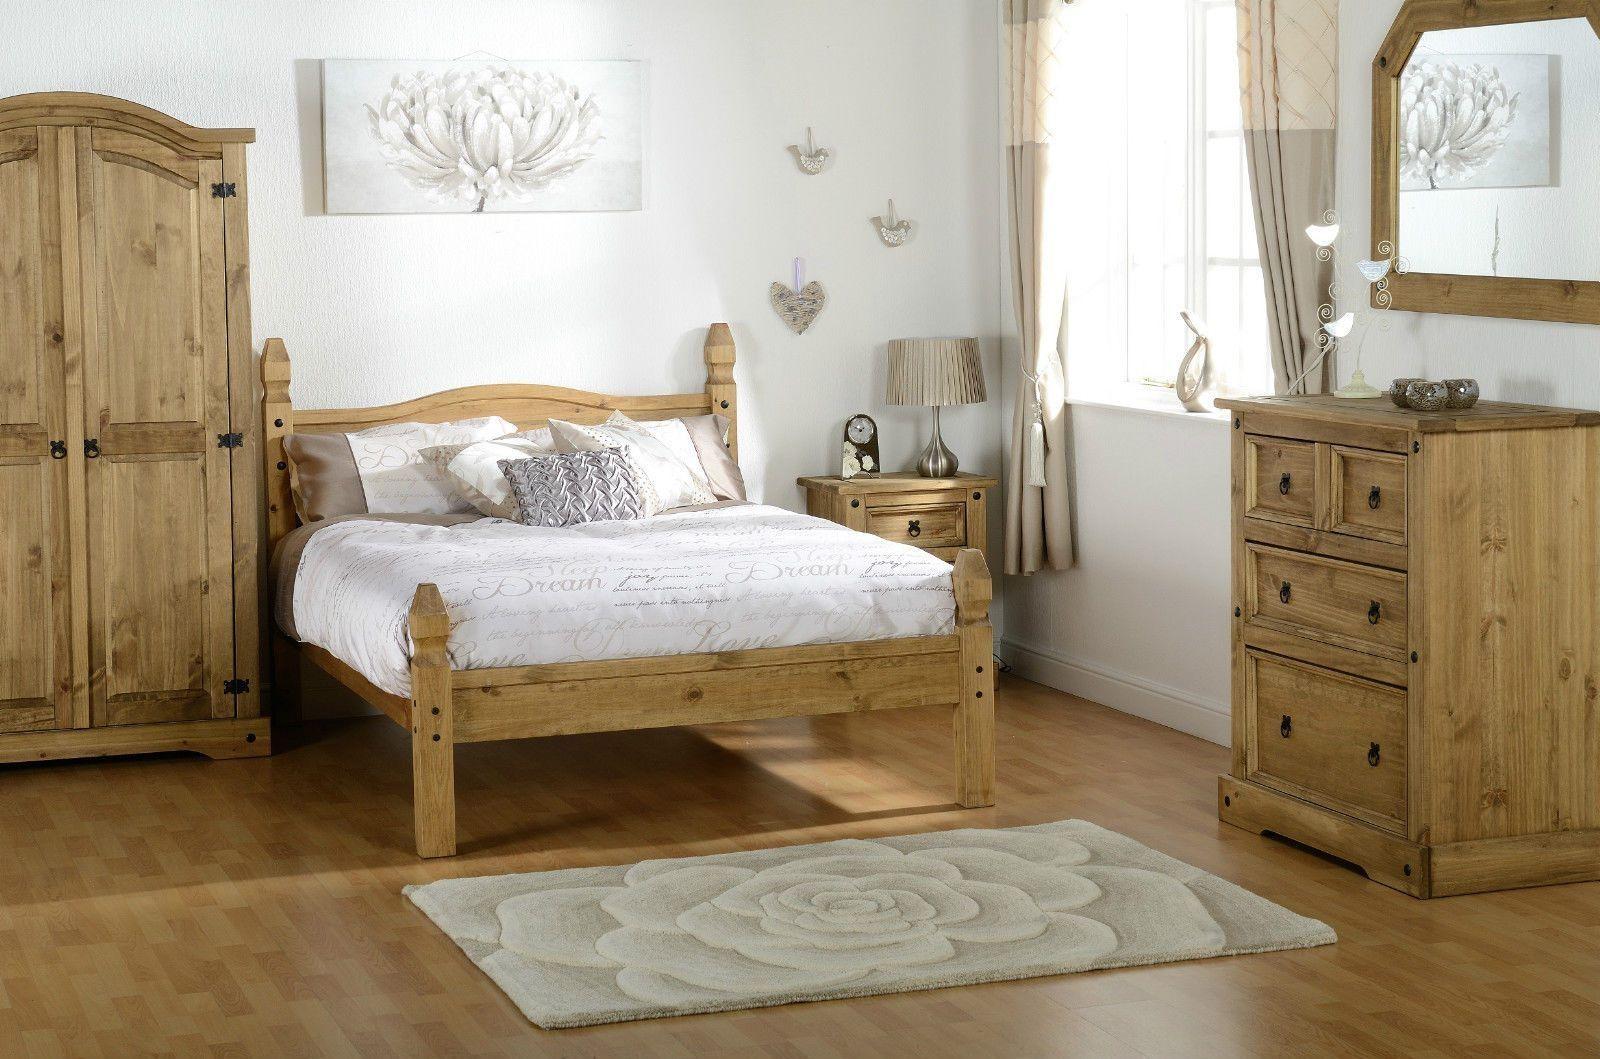 Corona bedroom furniture set bedroom furniture pinterest